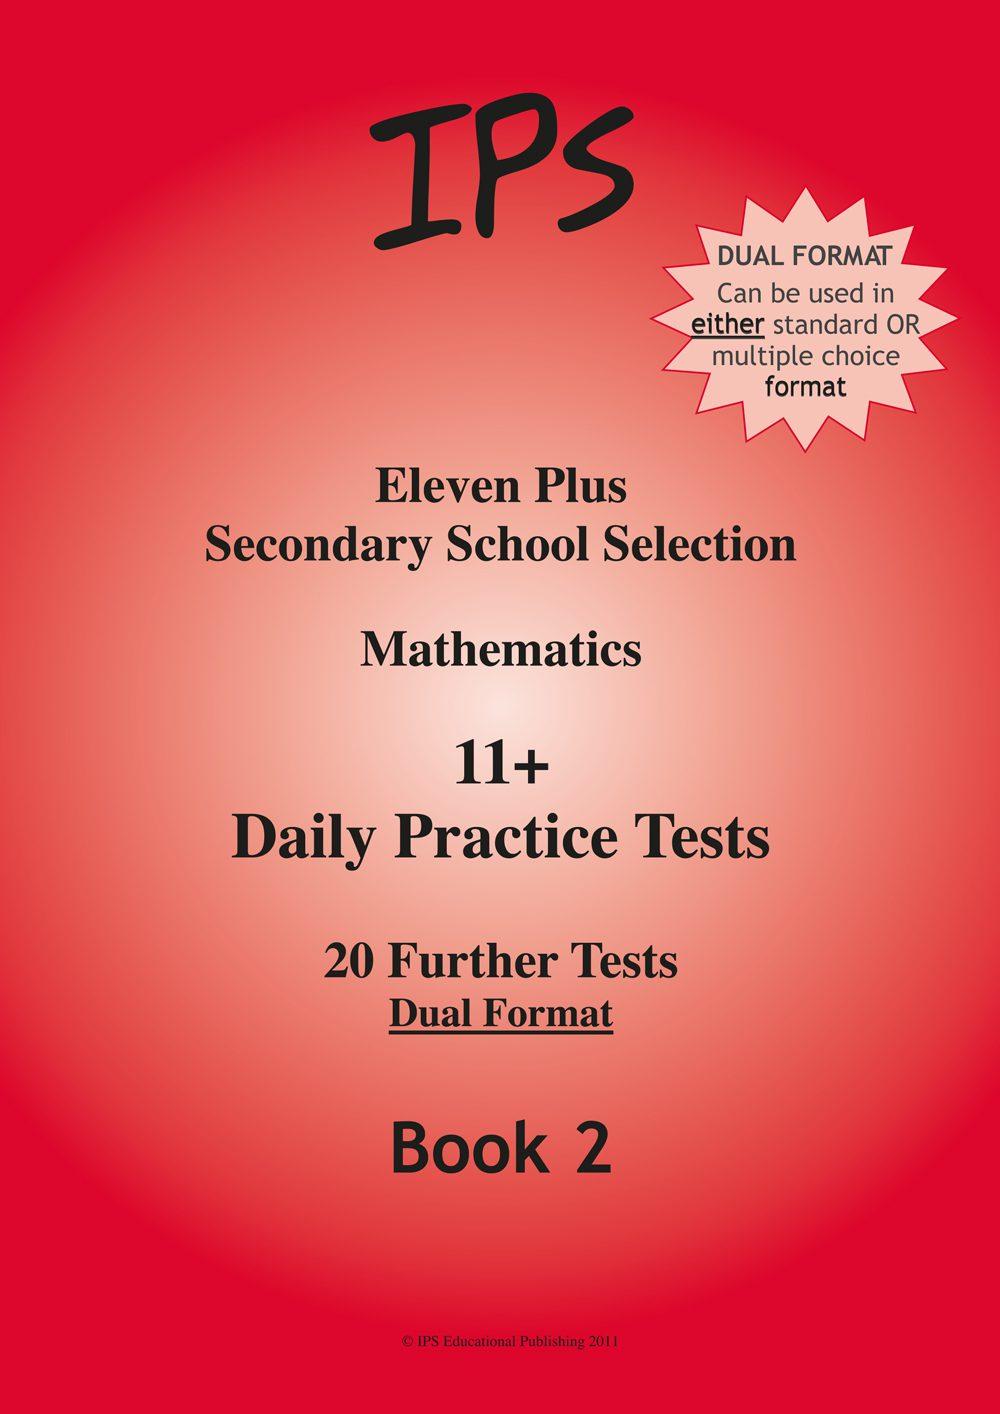 11 Plus Mathematics - Daily Practice Tests 2